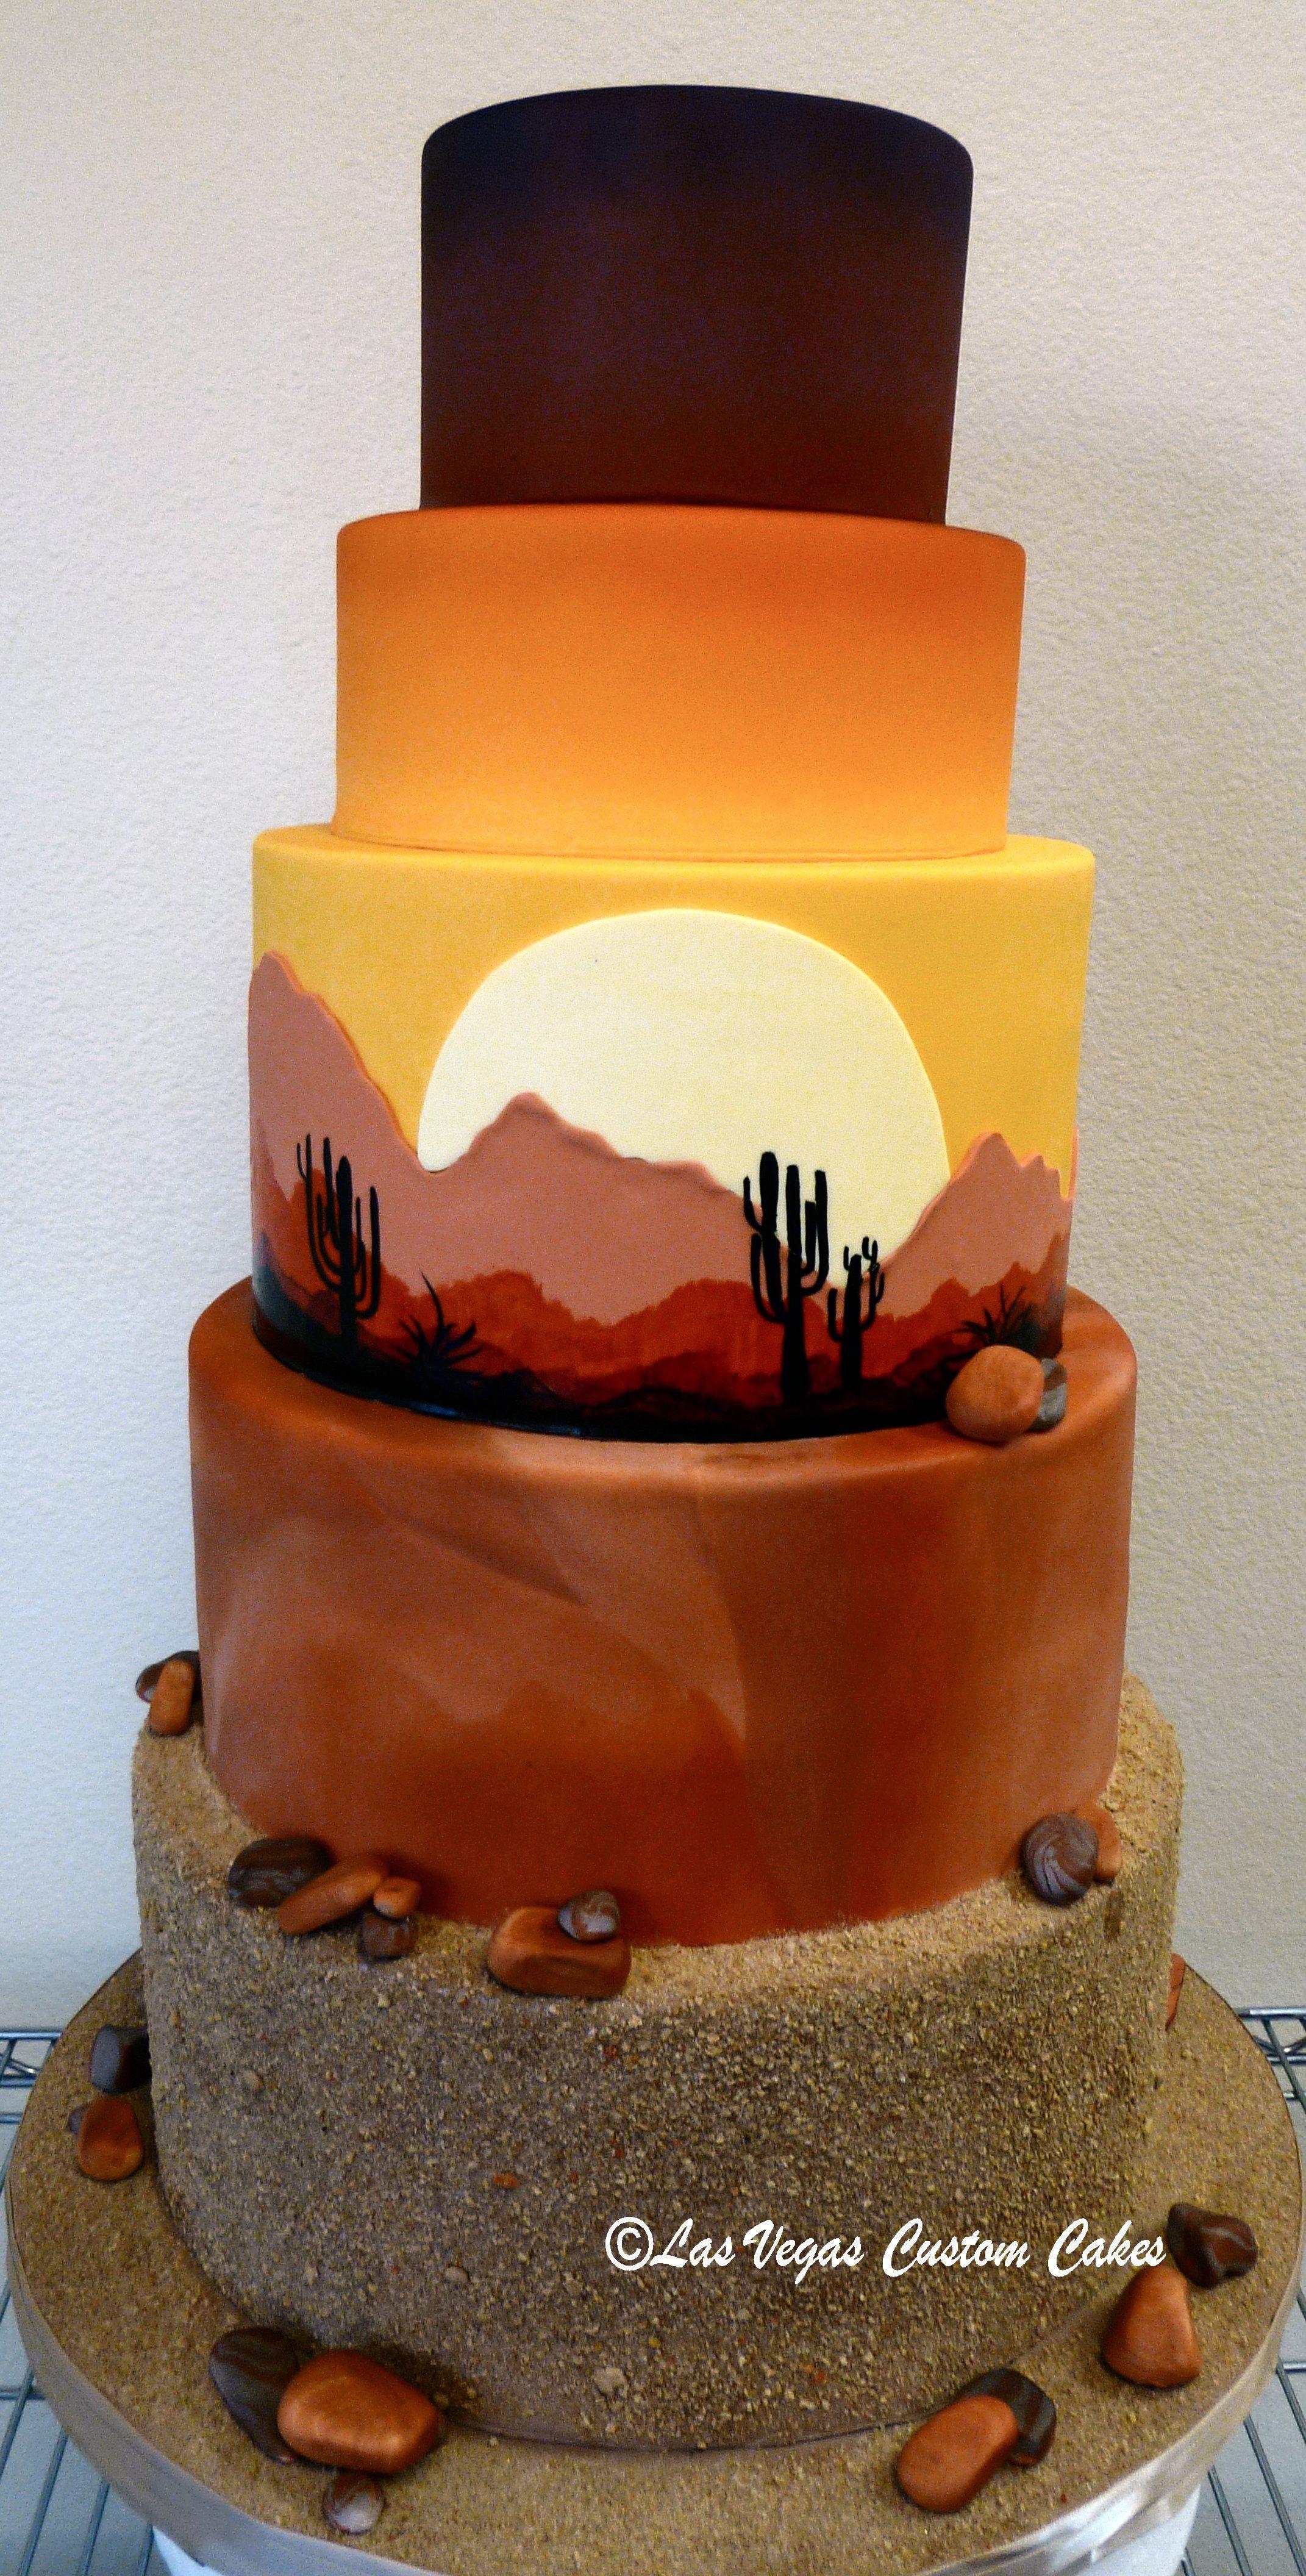 unique wedding cake with a sunrise desert scene made by las vegas